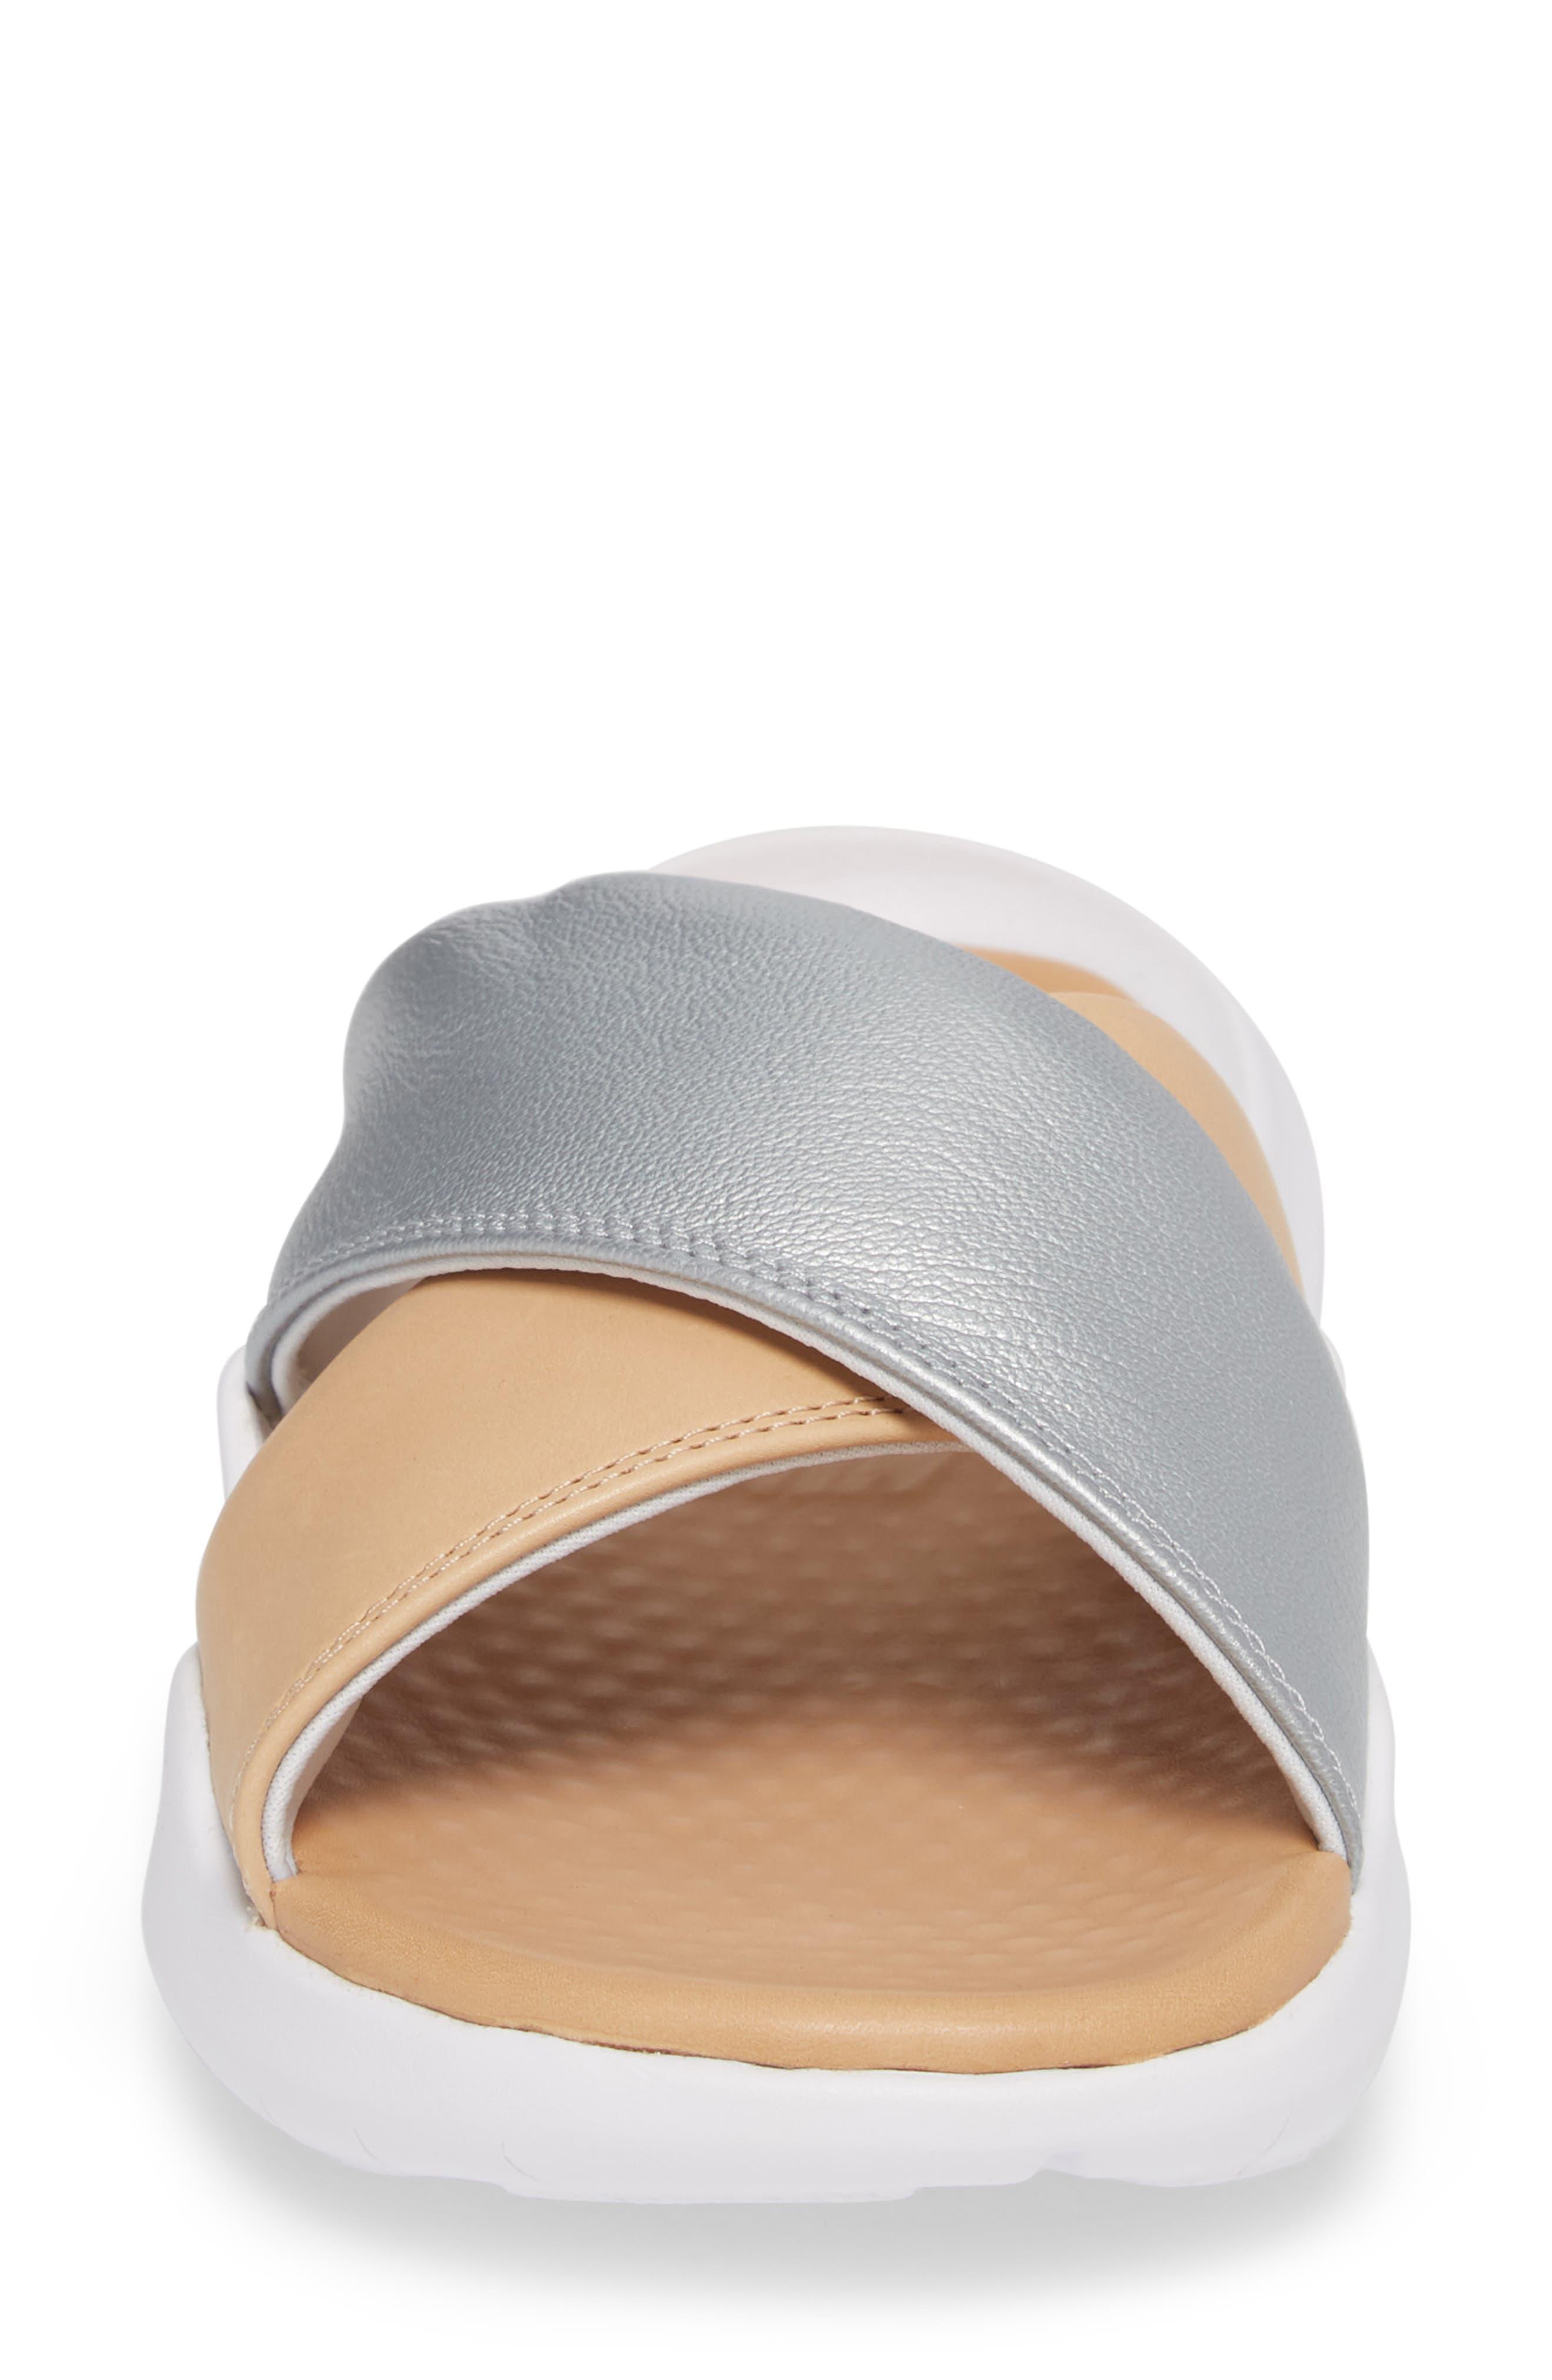 Nordstrom x Nike Benassi Future Cross SE Premium Slide,                             Alternate thumbnail 4, color,                             METALLIC SILVER/ BIO BEIGE